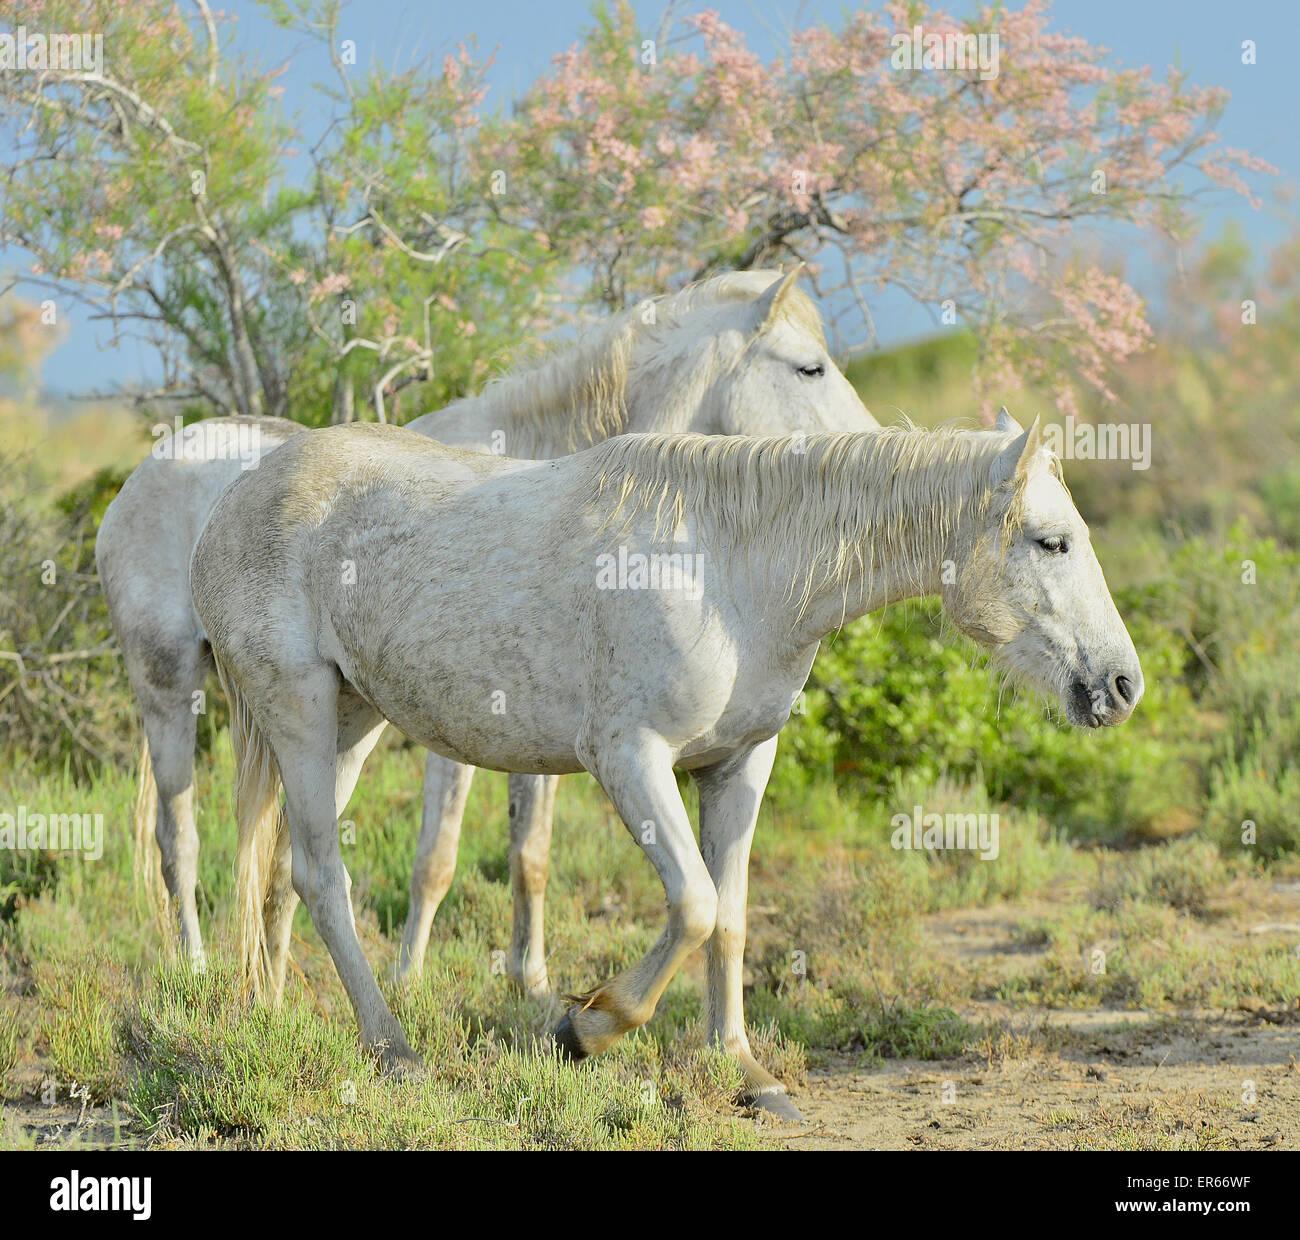 Portrait of the White Camargue Horses in Parc Regional de Camargue - Provence, France - Stock Image